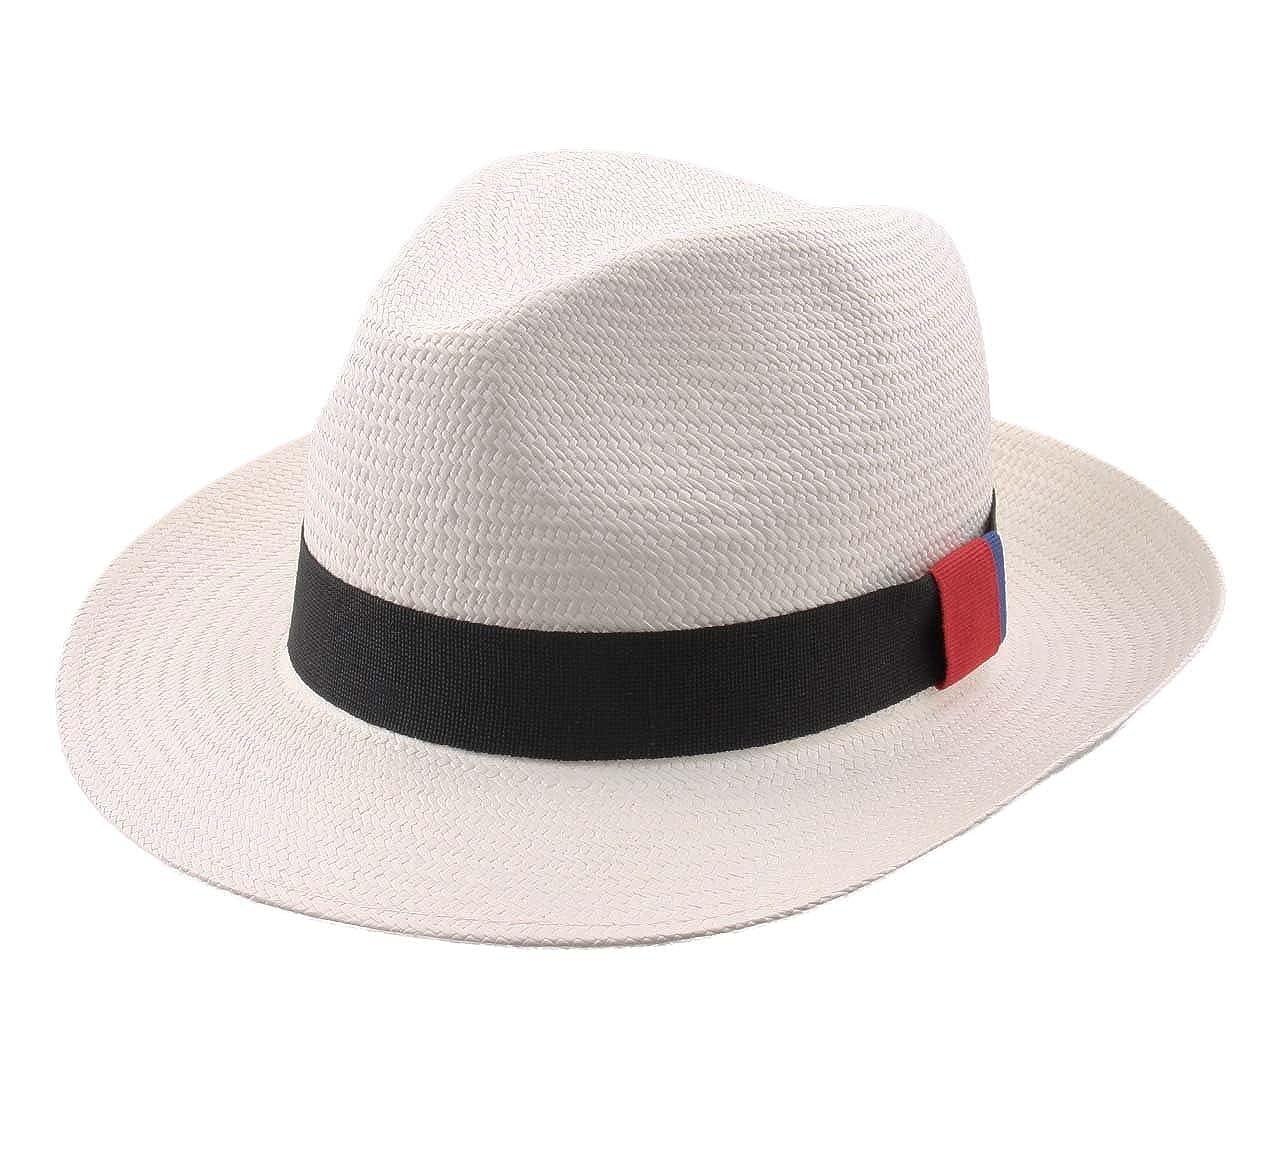 Modissima Sombrero panamá Panama Talla 62 cm: Amazon.es